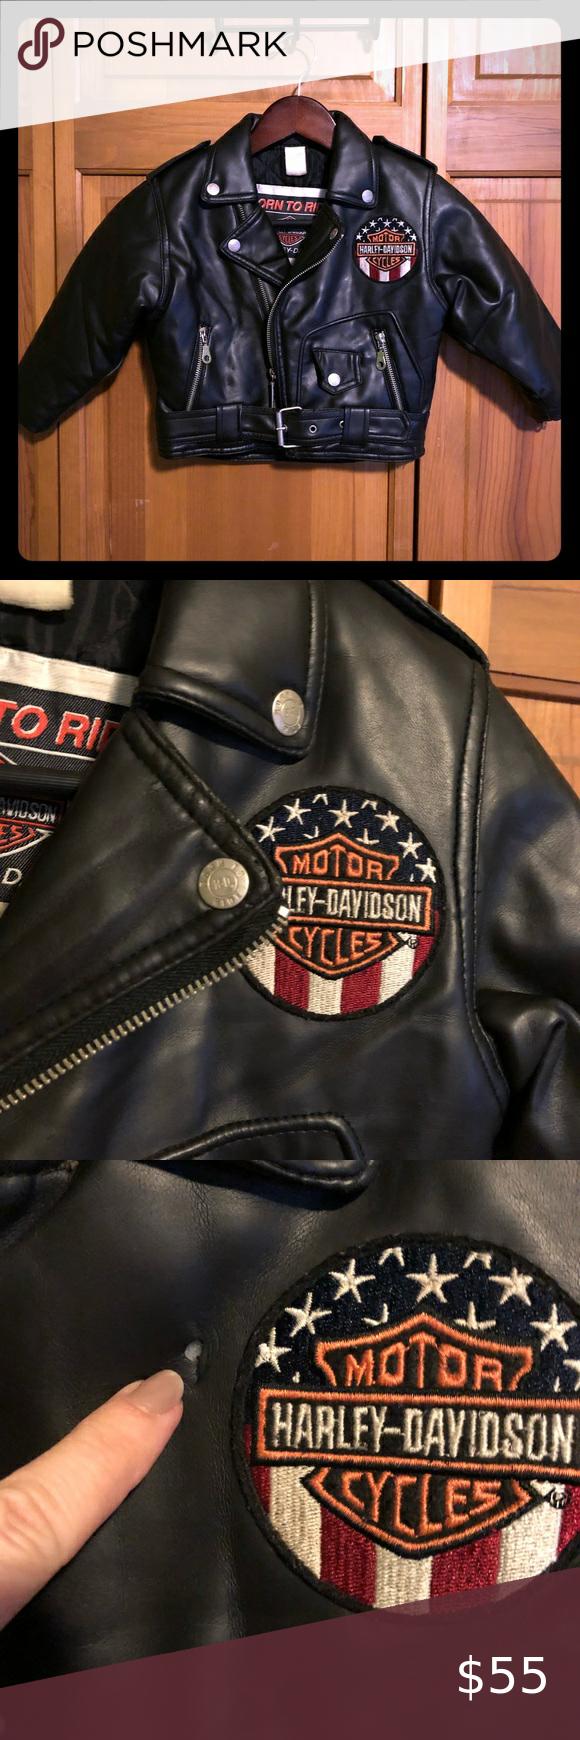 Kids Harley Davidson Born To Ride Jacket Size 4 Kids Harley Davidson Black Leather Look Born To Ride Jacket Size 4 Great Co Harley Davidson Davidson Harley [ 1740 x 580 Pixel ]